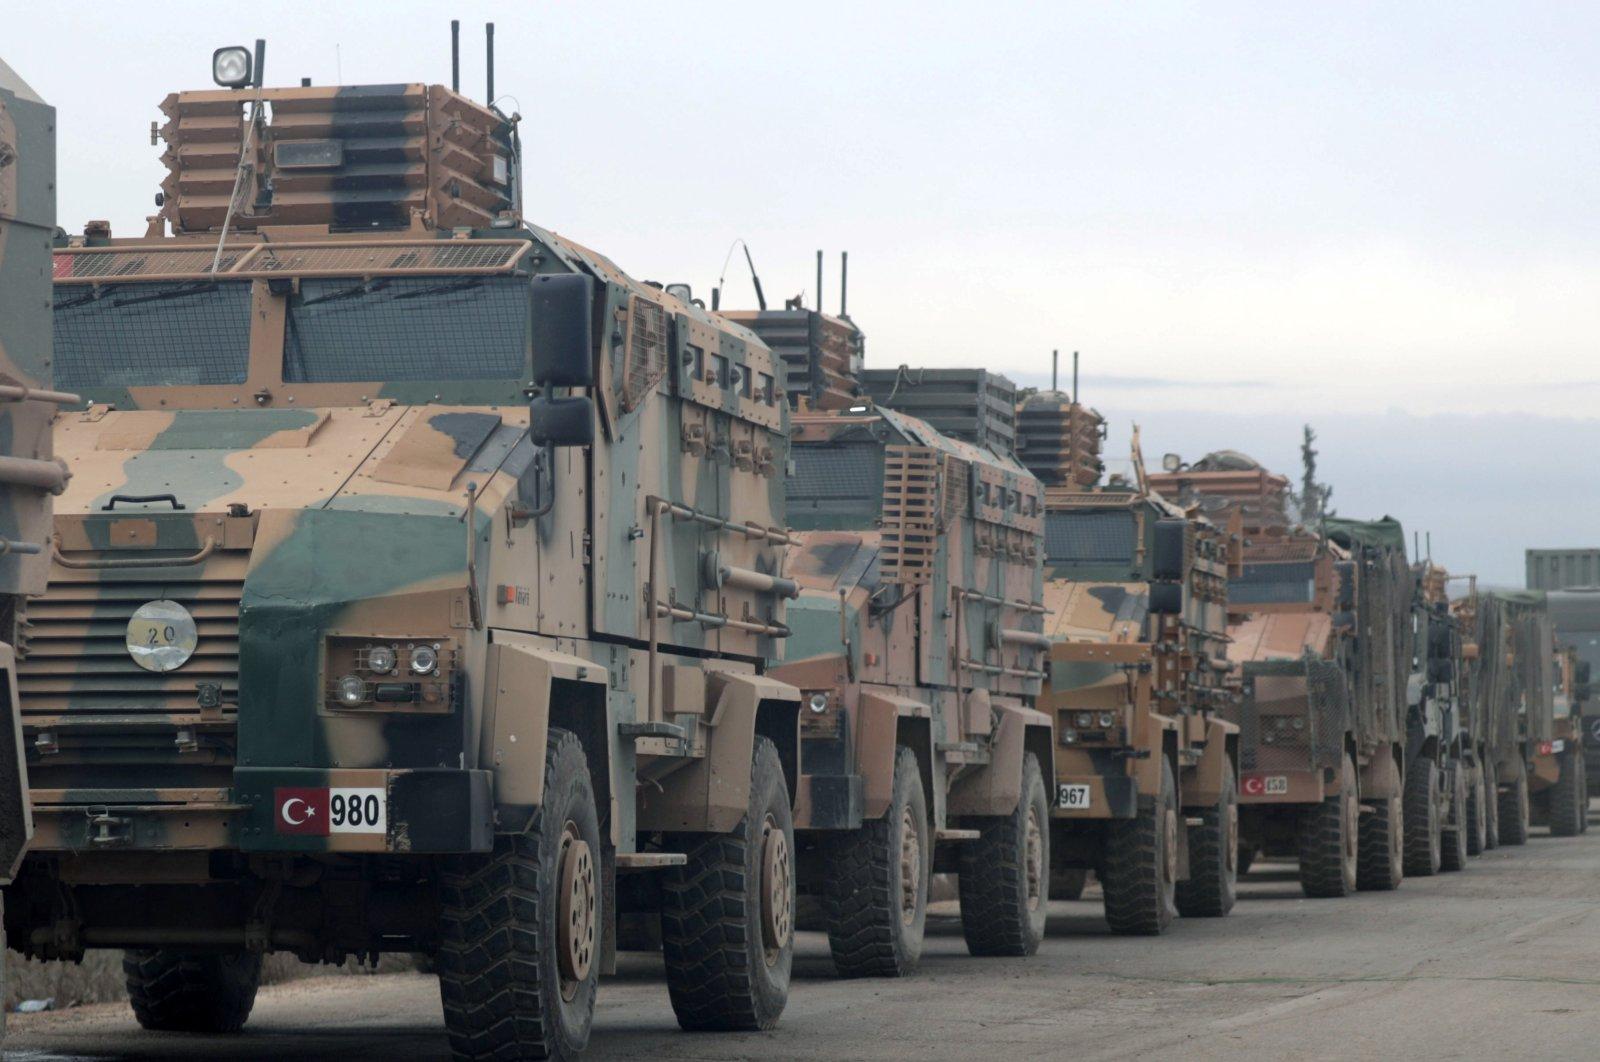 Turkish military vehicles are seen in Hazano near Idlib, Syria, Feb. 11, 2020. (Reuters File Photo)